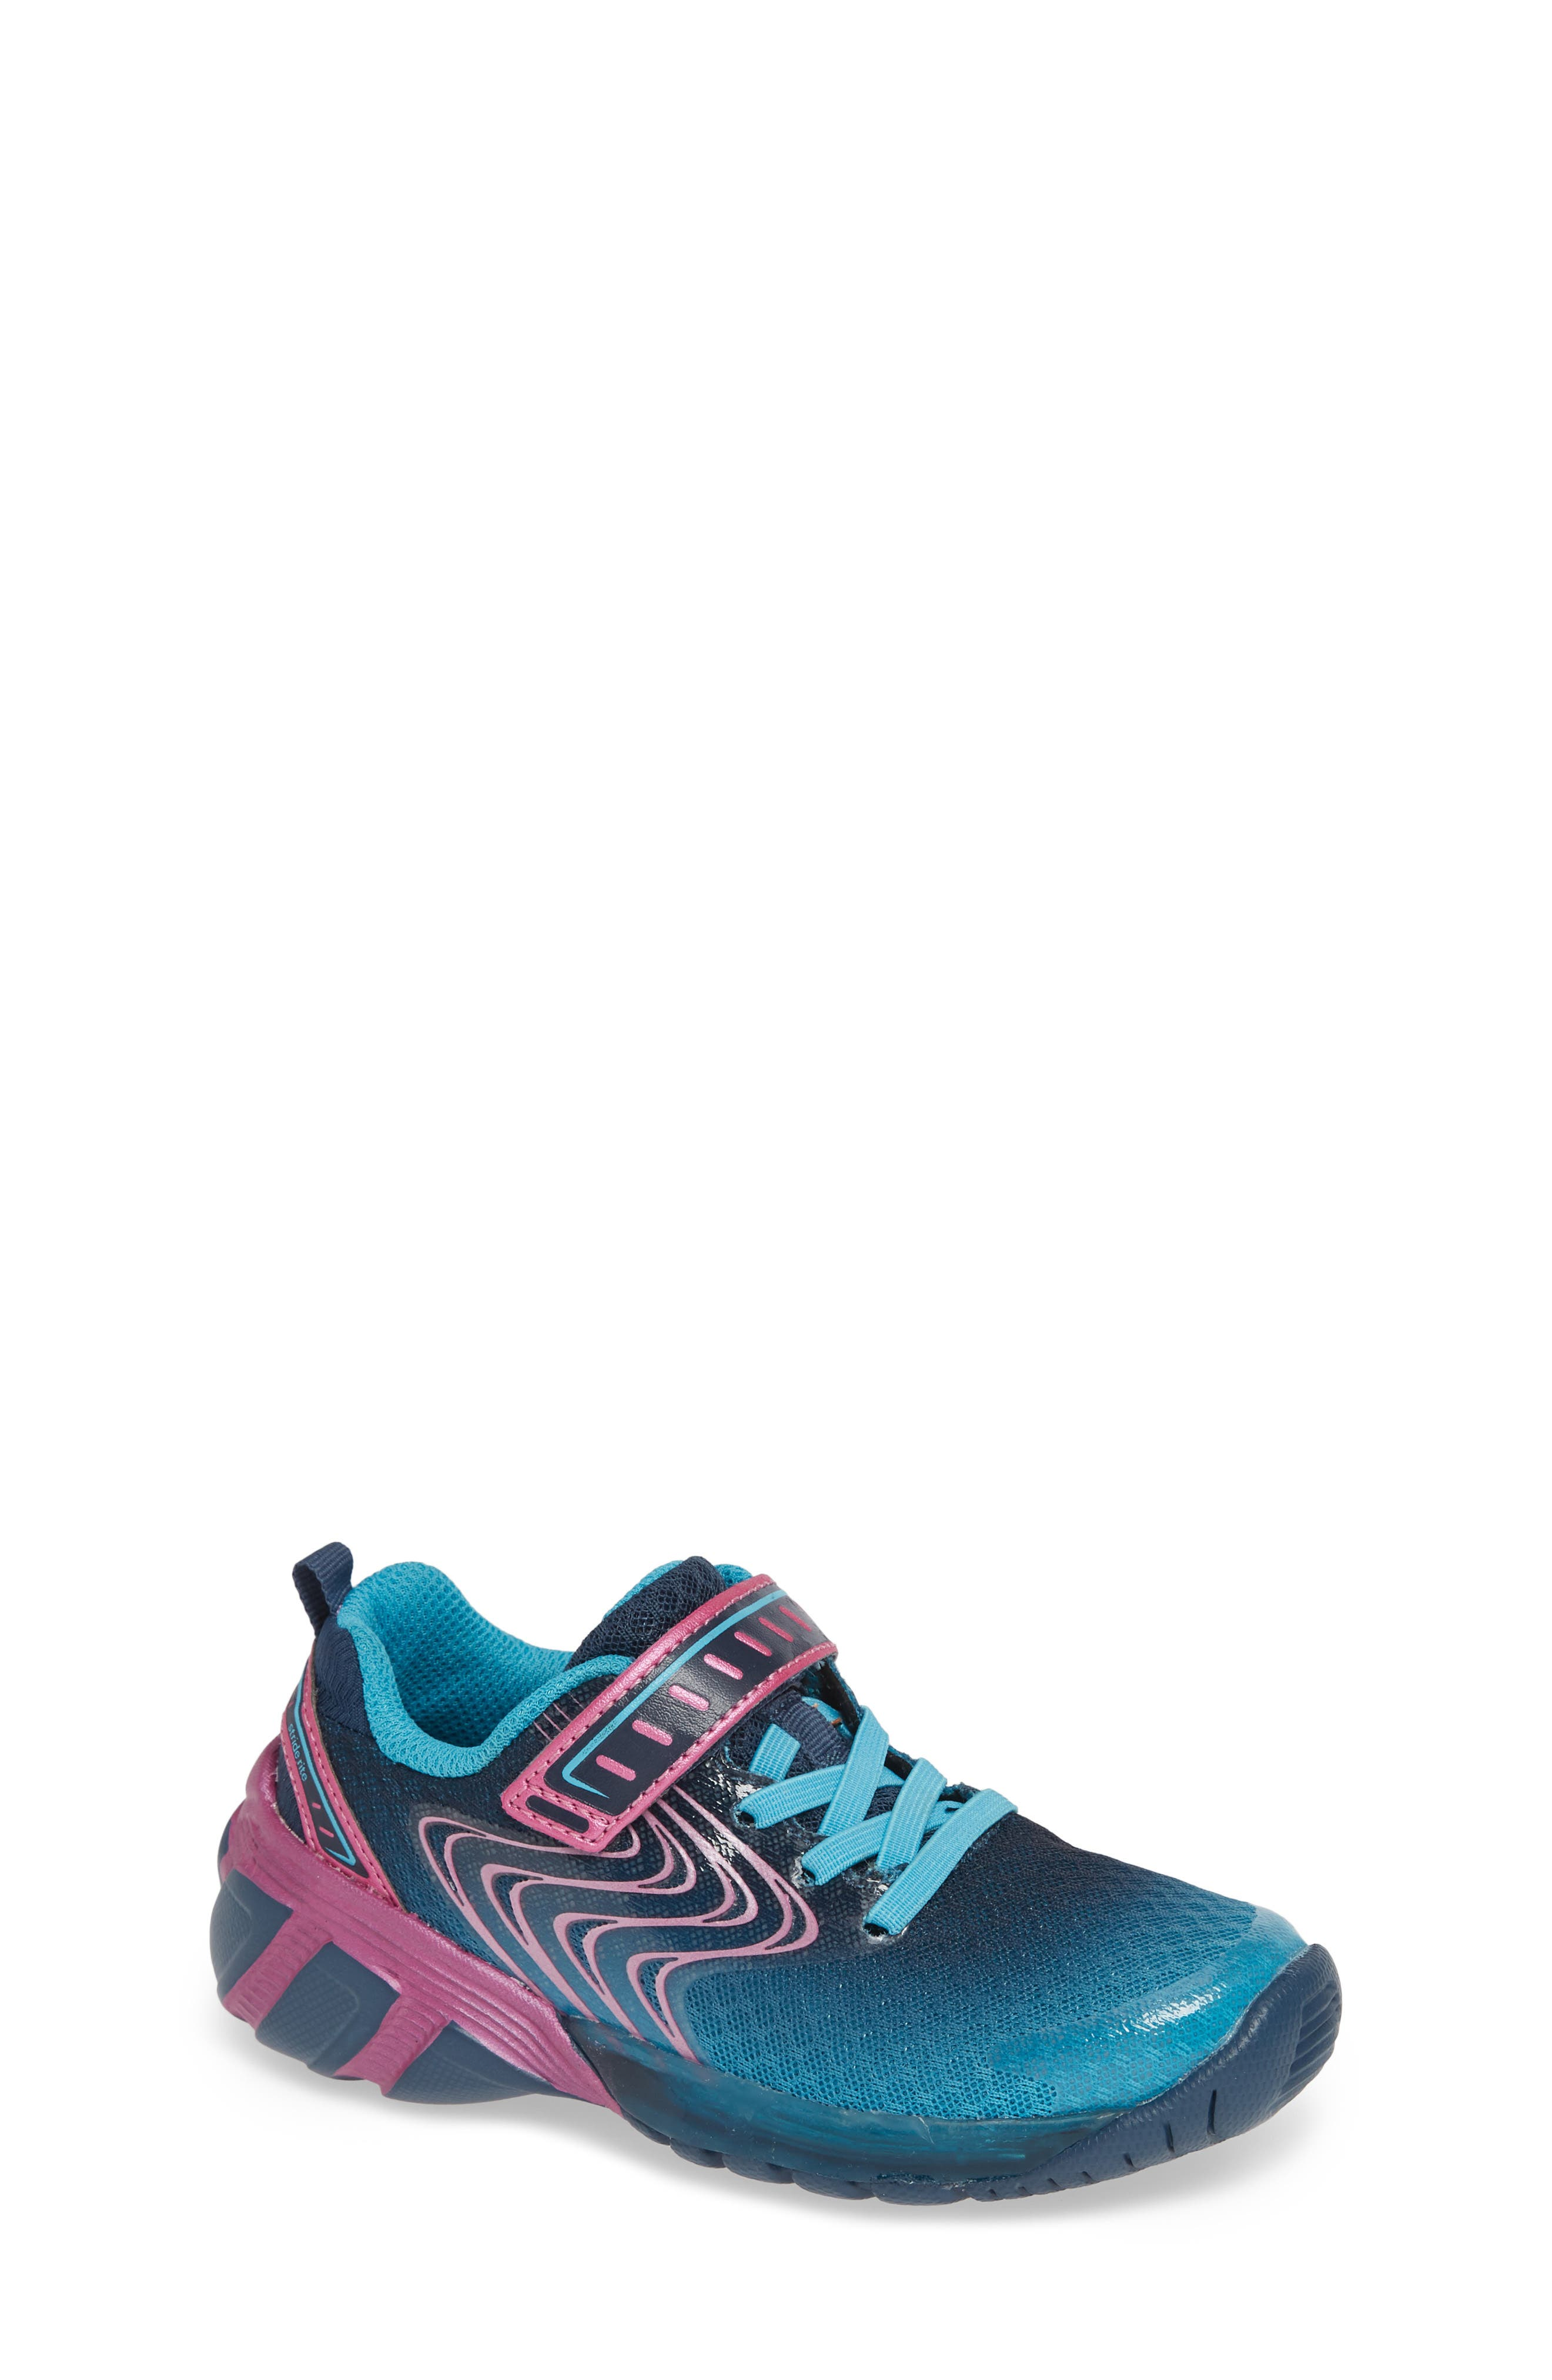 Lights Lux Light-Up Sneaker,                         Main,                         color, 400